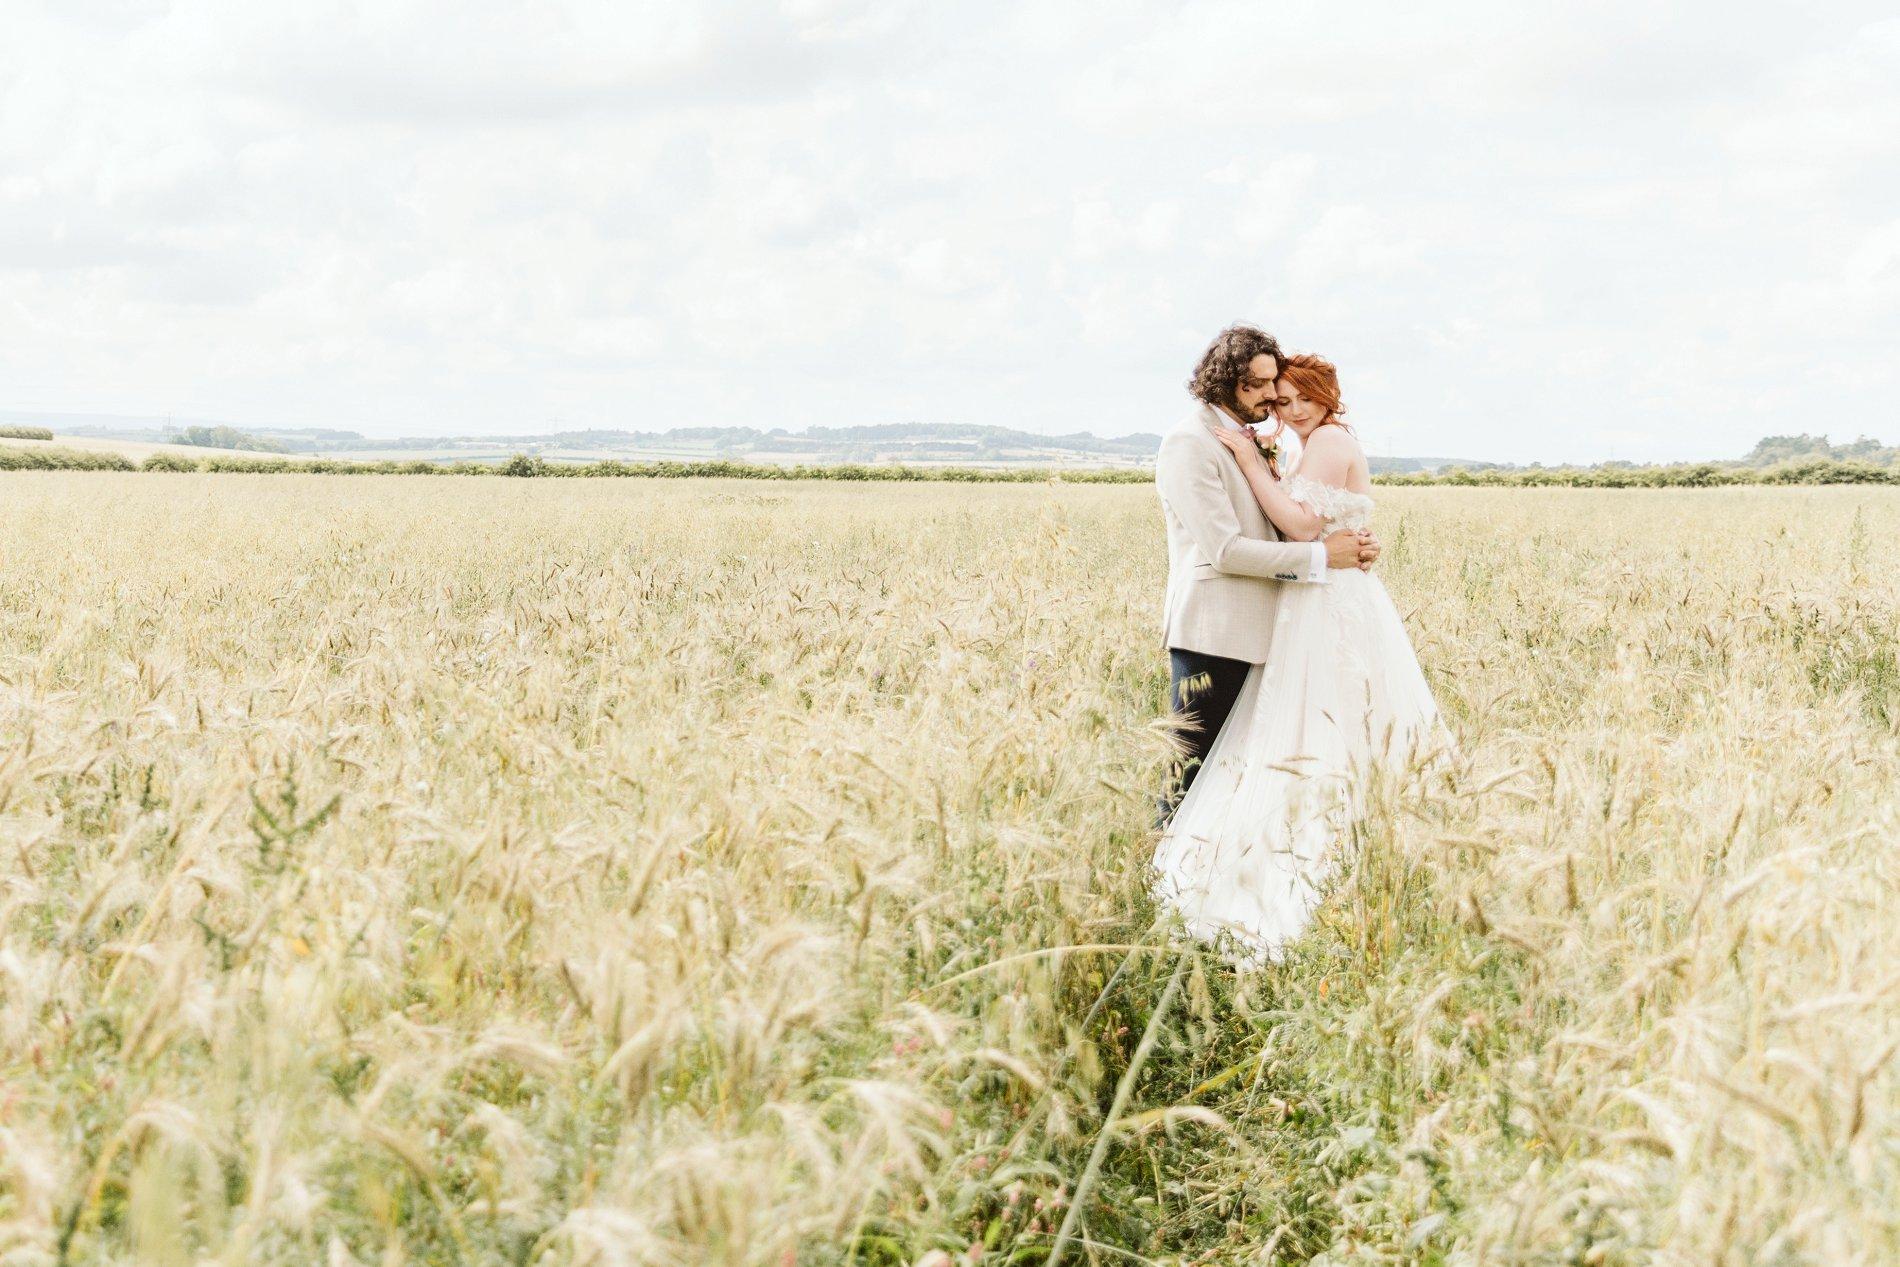 Saying I Do Rustic Wedding Creative Shoot (c) Charlotte Eve Photography (9)